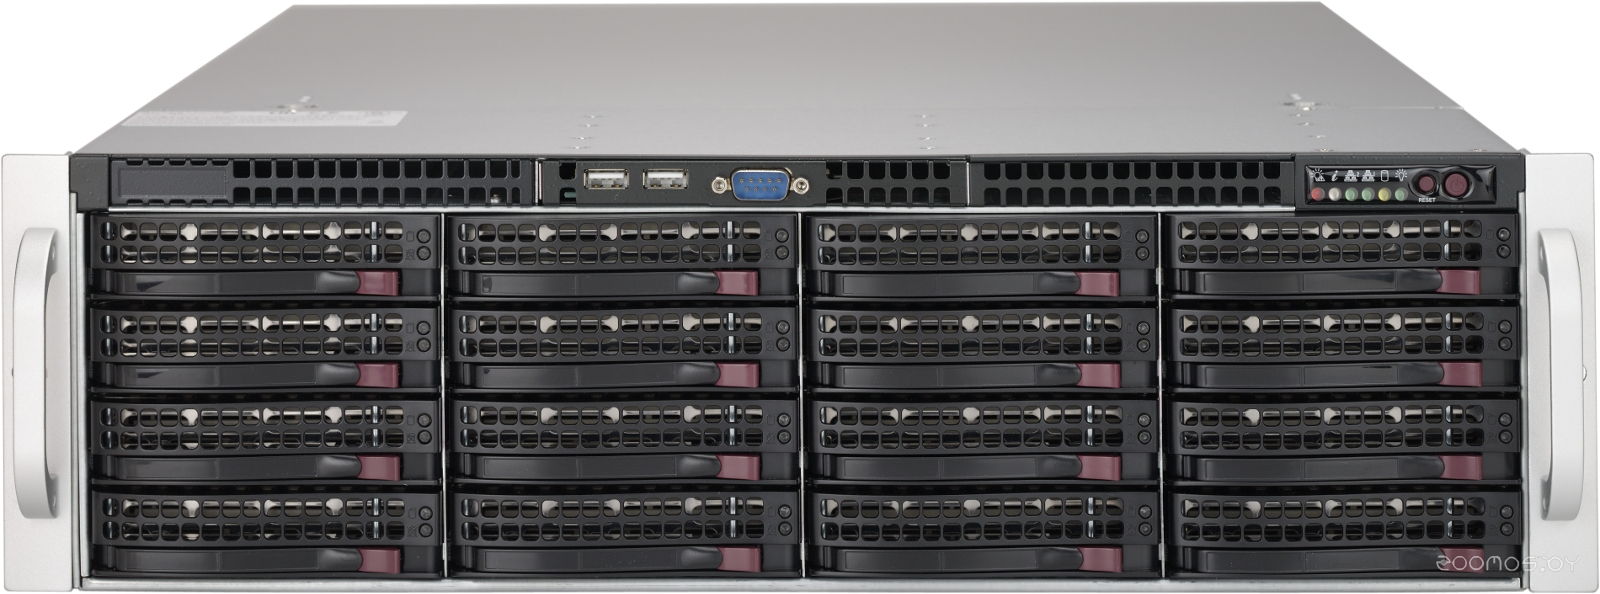 Серверная платформа Supermicro SSG-6039P-E1CR16L